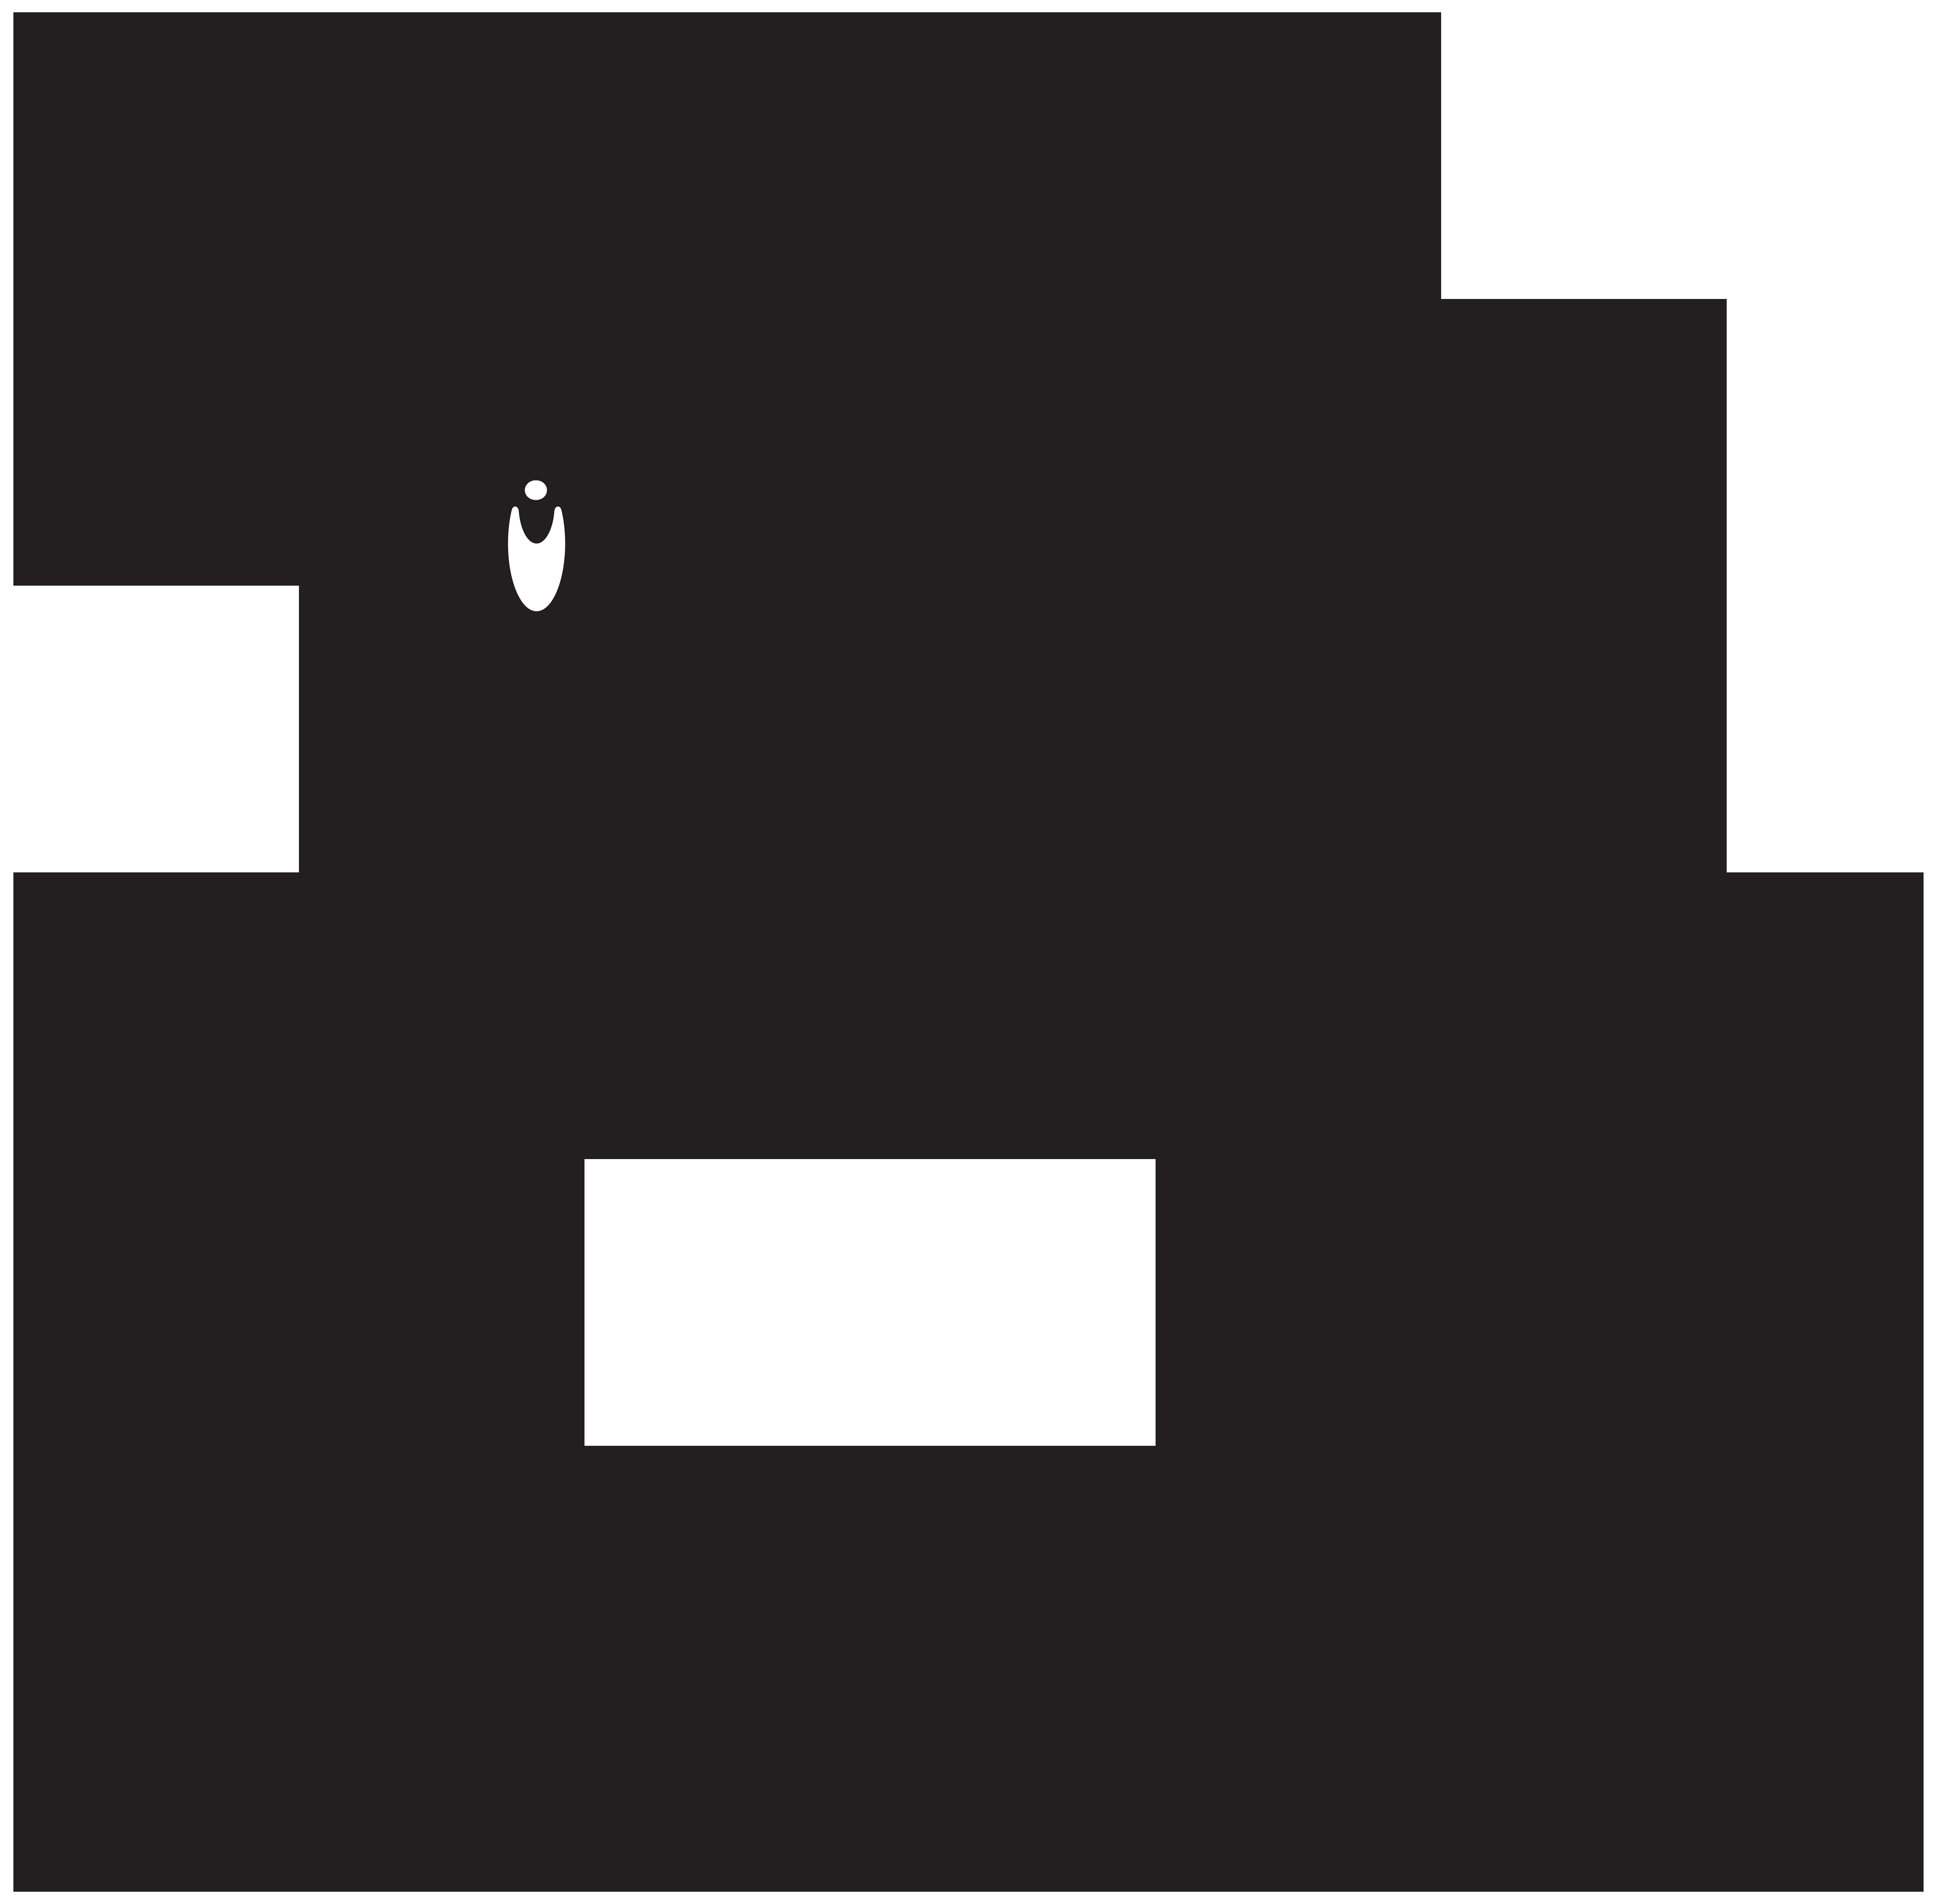 African clipart silhouette. Women png clip art